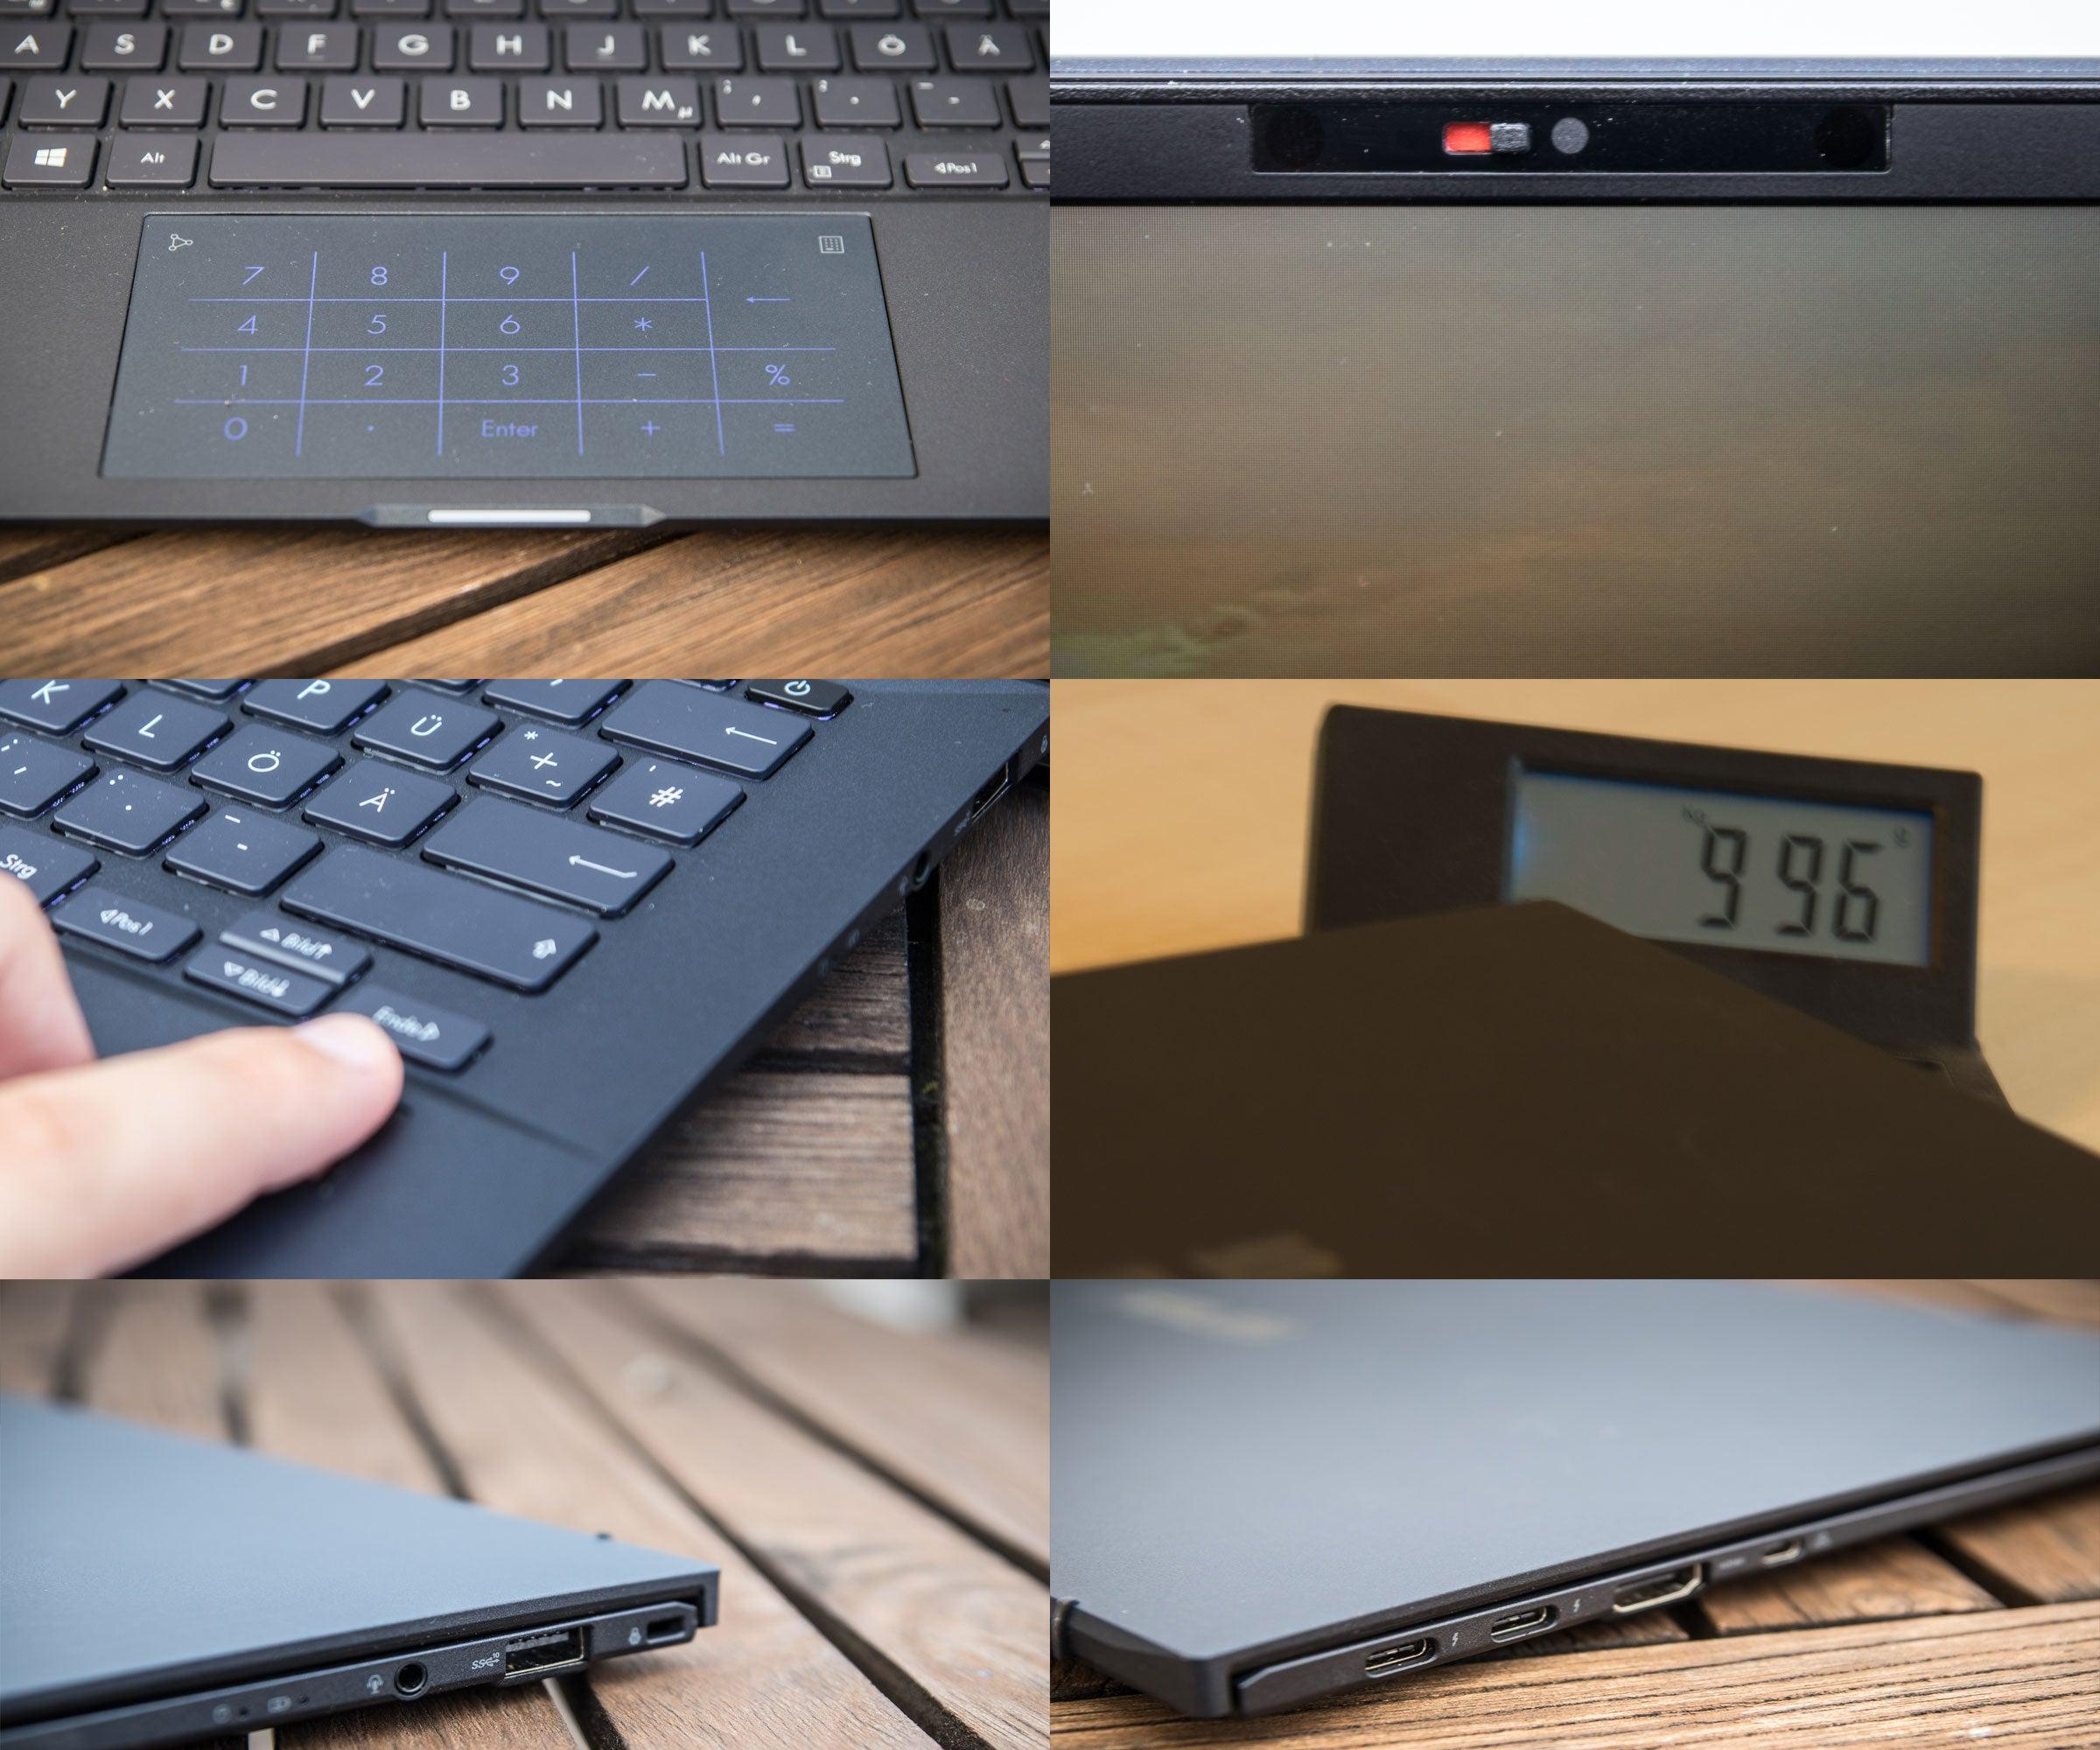 Detailbilder des Asus ExpertBook B9